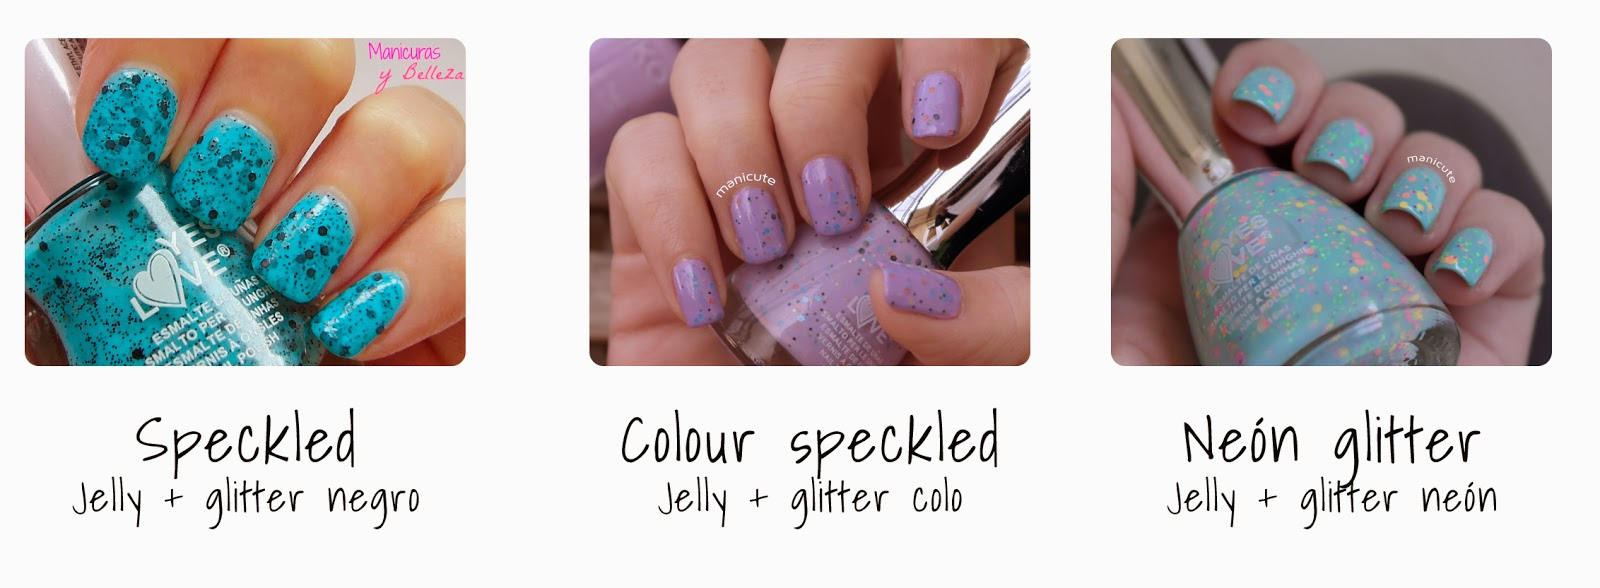 Yes Love glitter neon